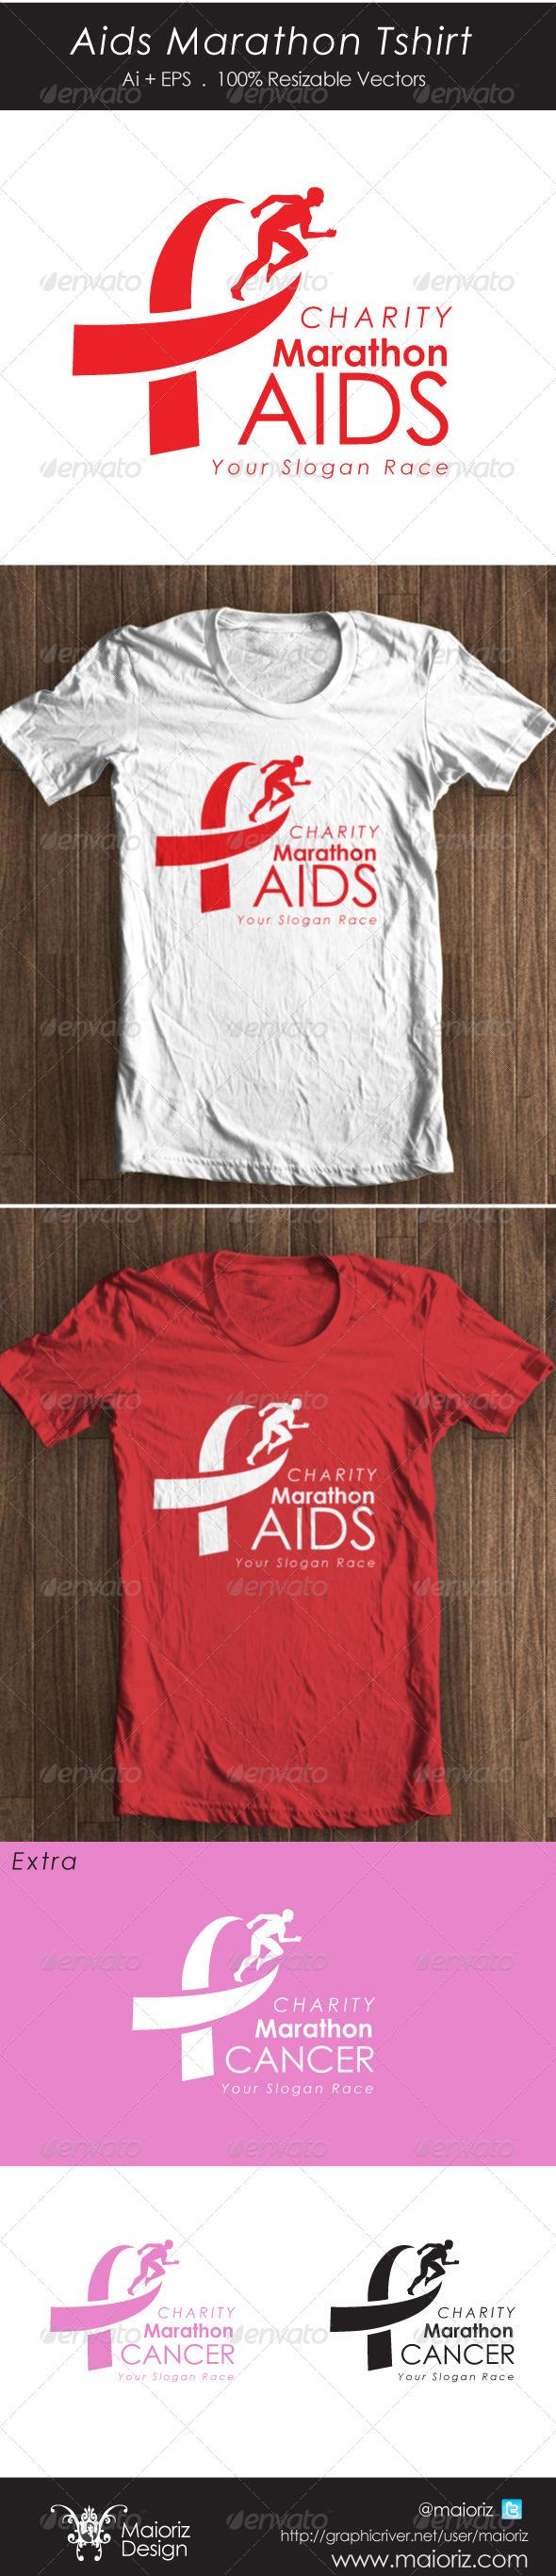 GraphicRiver Aids Marathon Tshirt 4452614